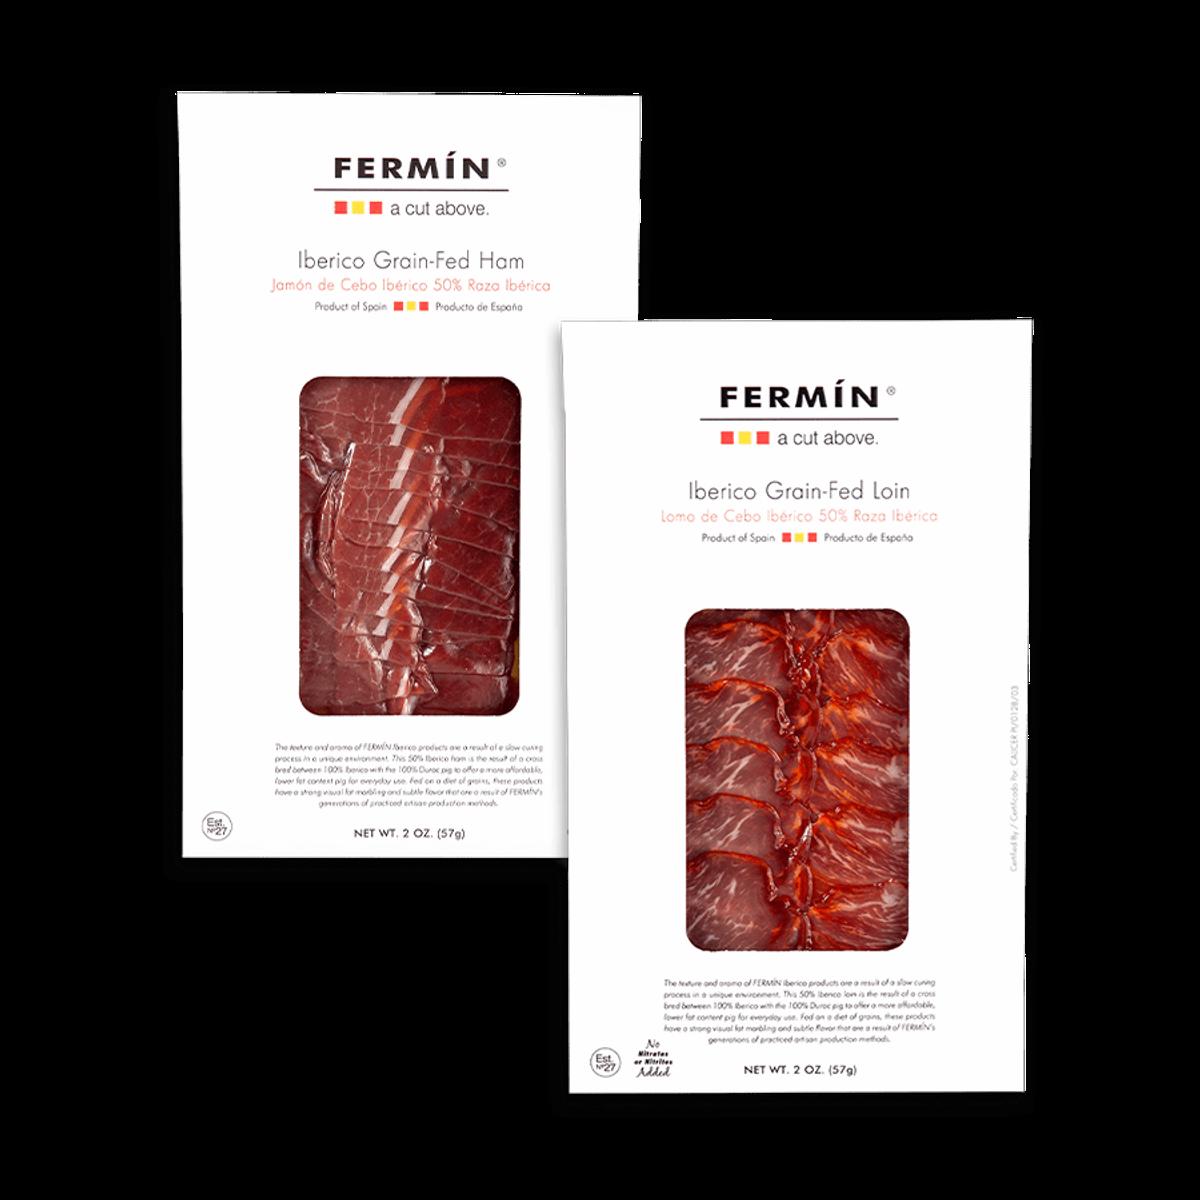 fermin 50 percent iberico sliced cured meats